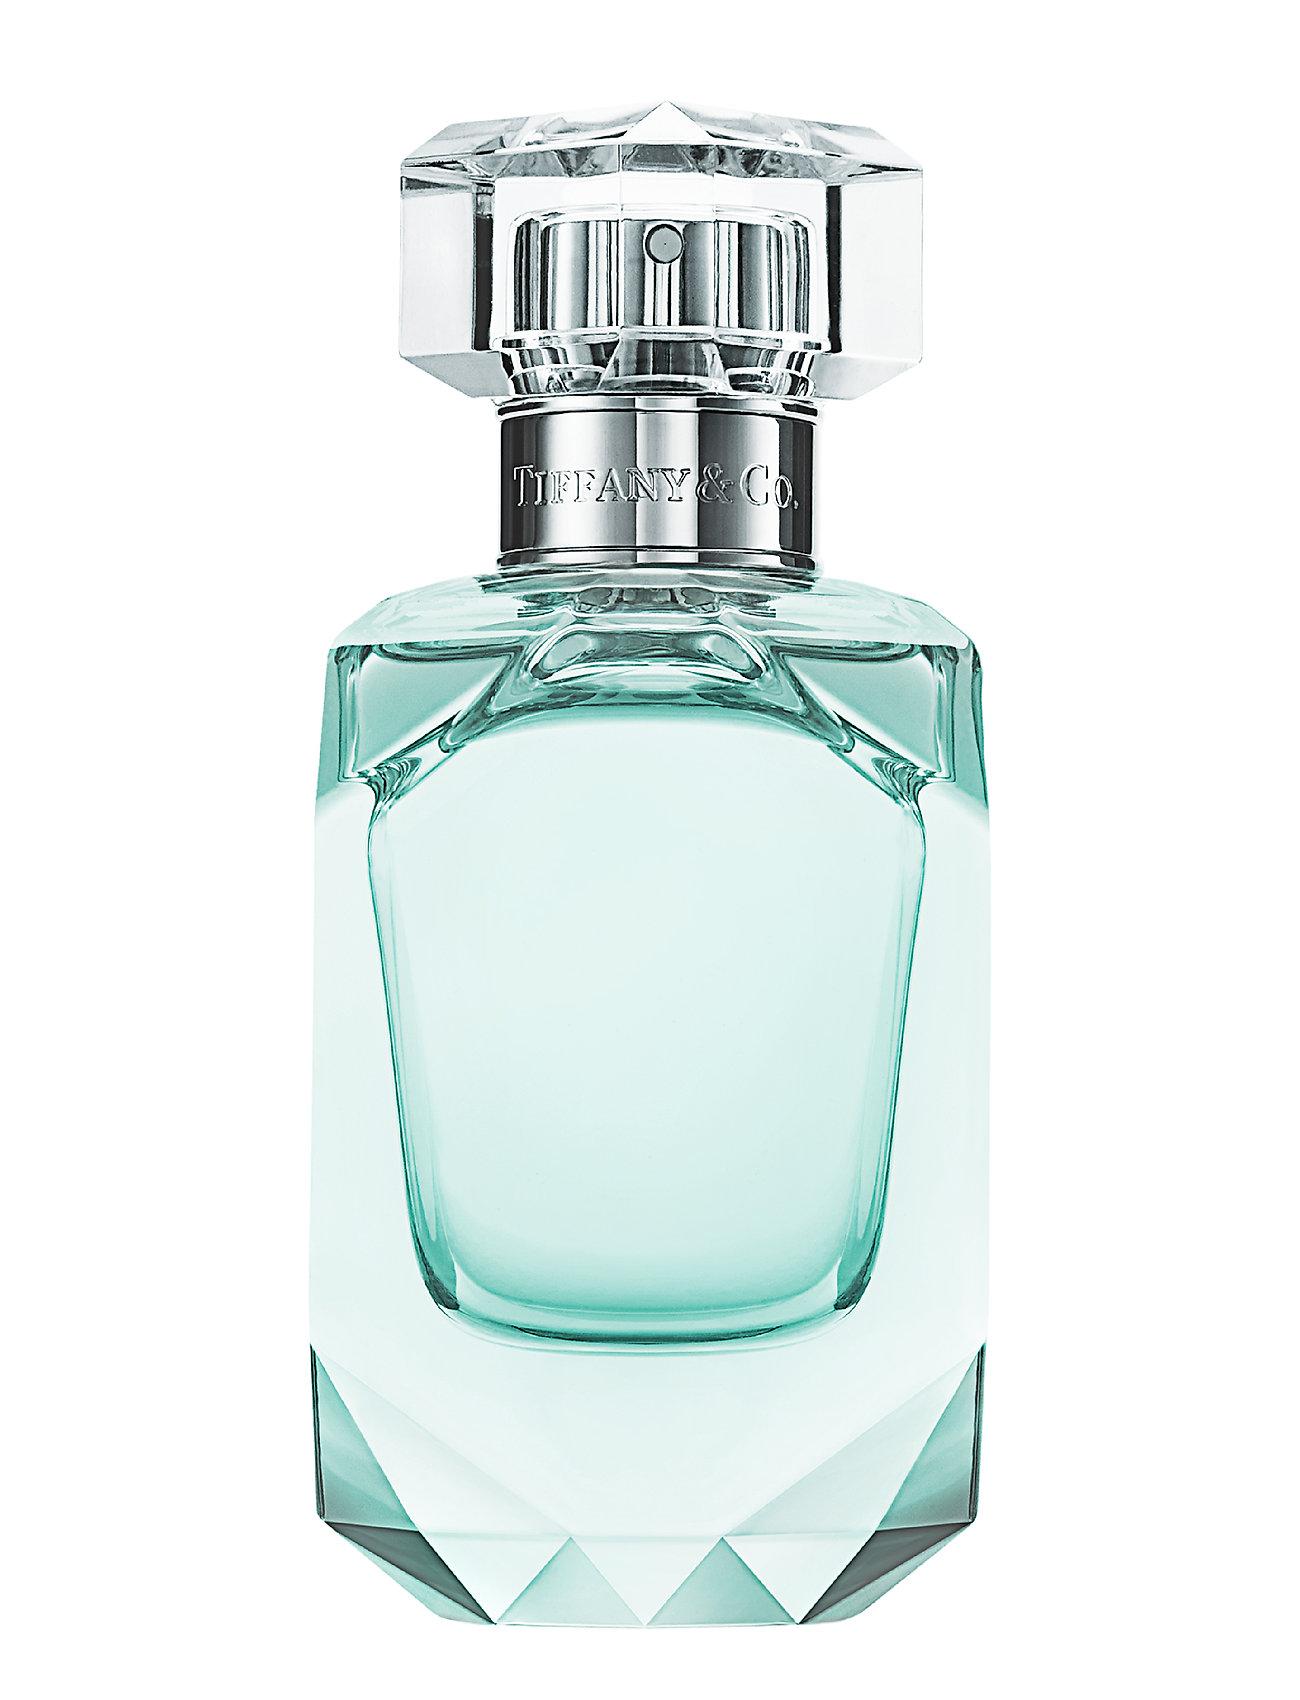 Tiffany TIFFANY & CO INTENSE EAU DEPARFUM - NO COLOR